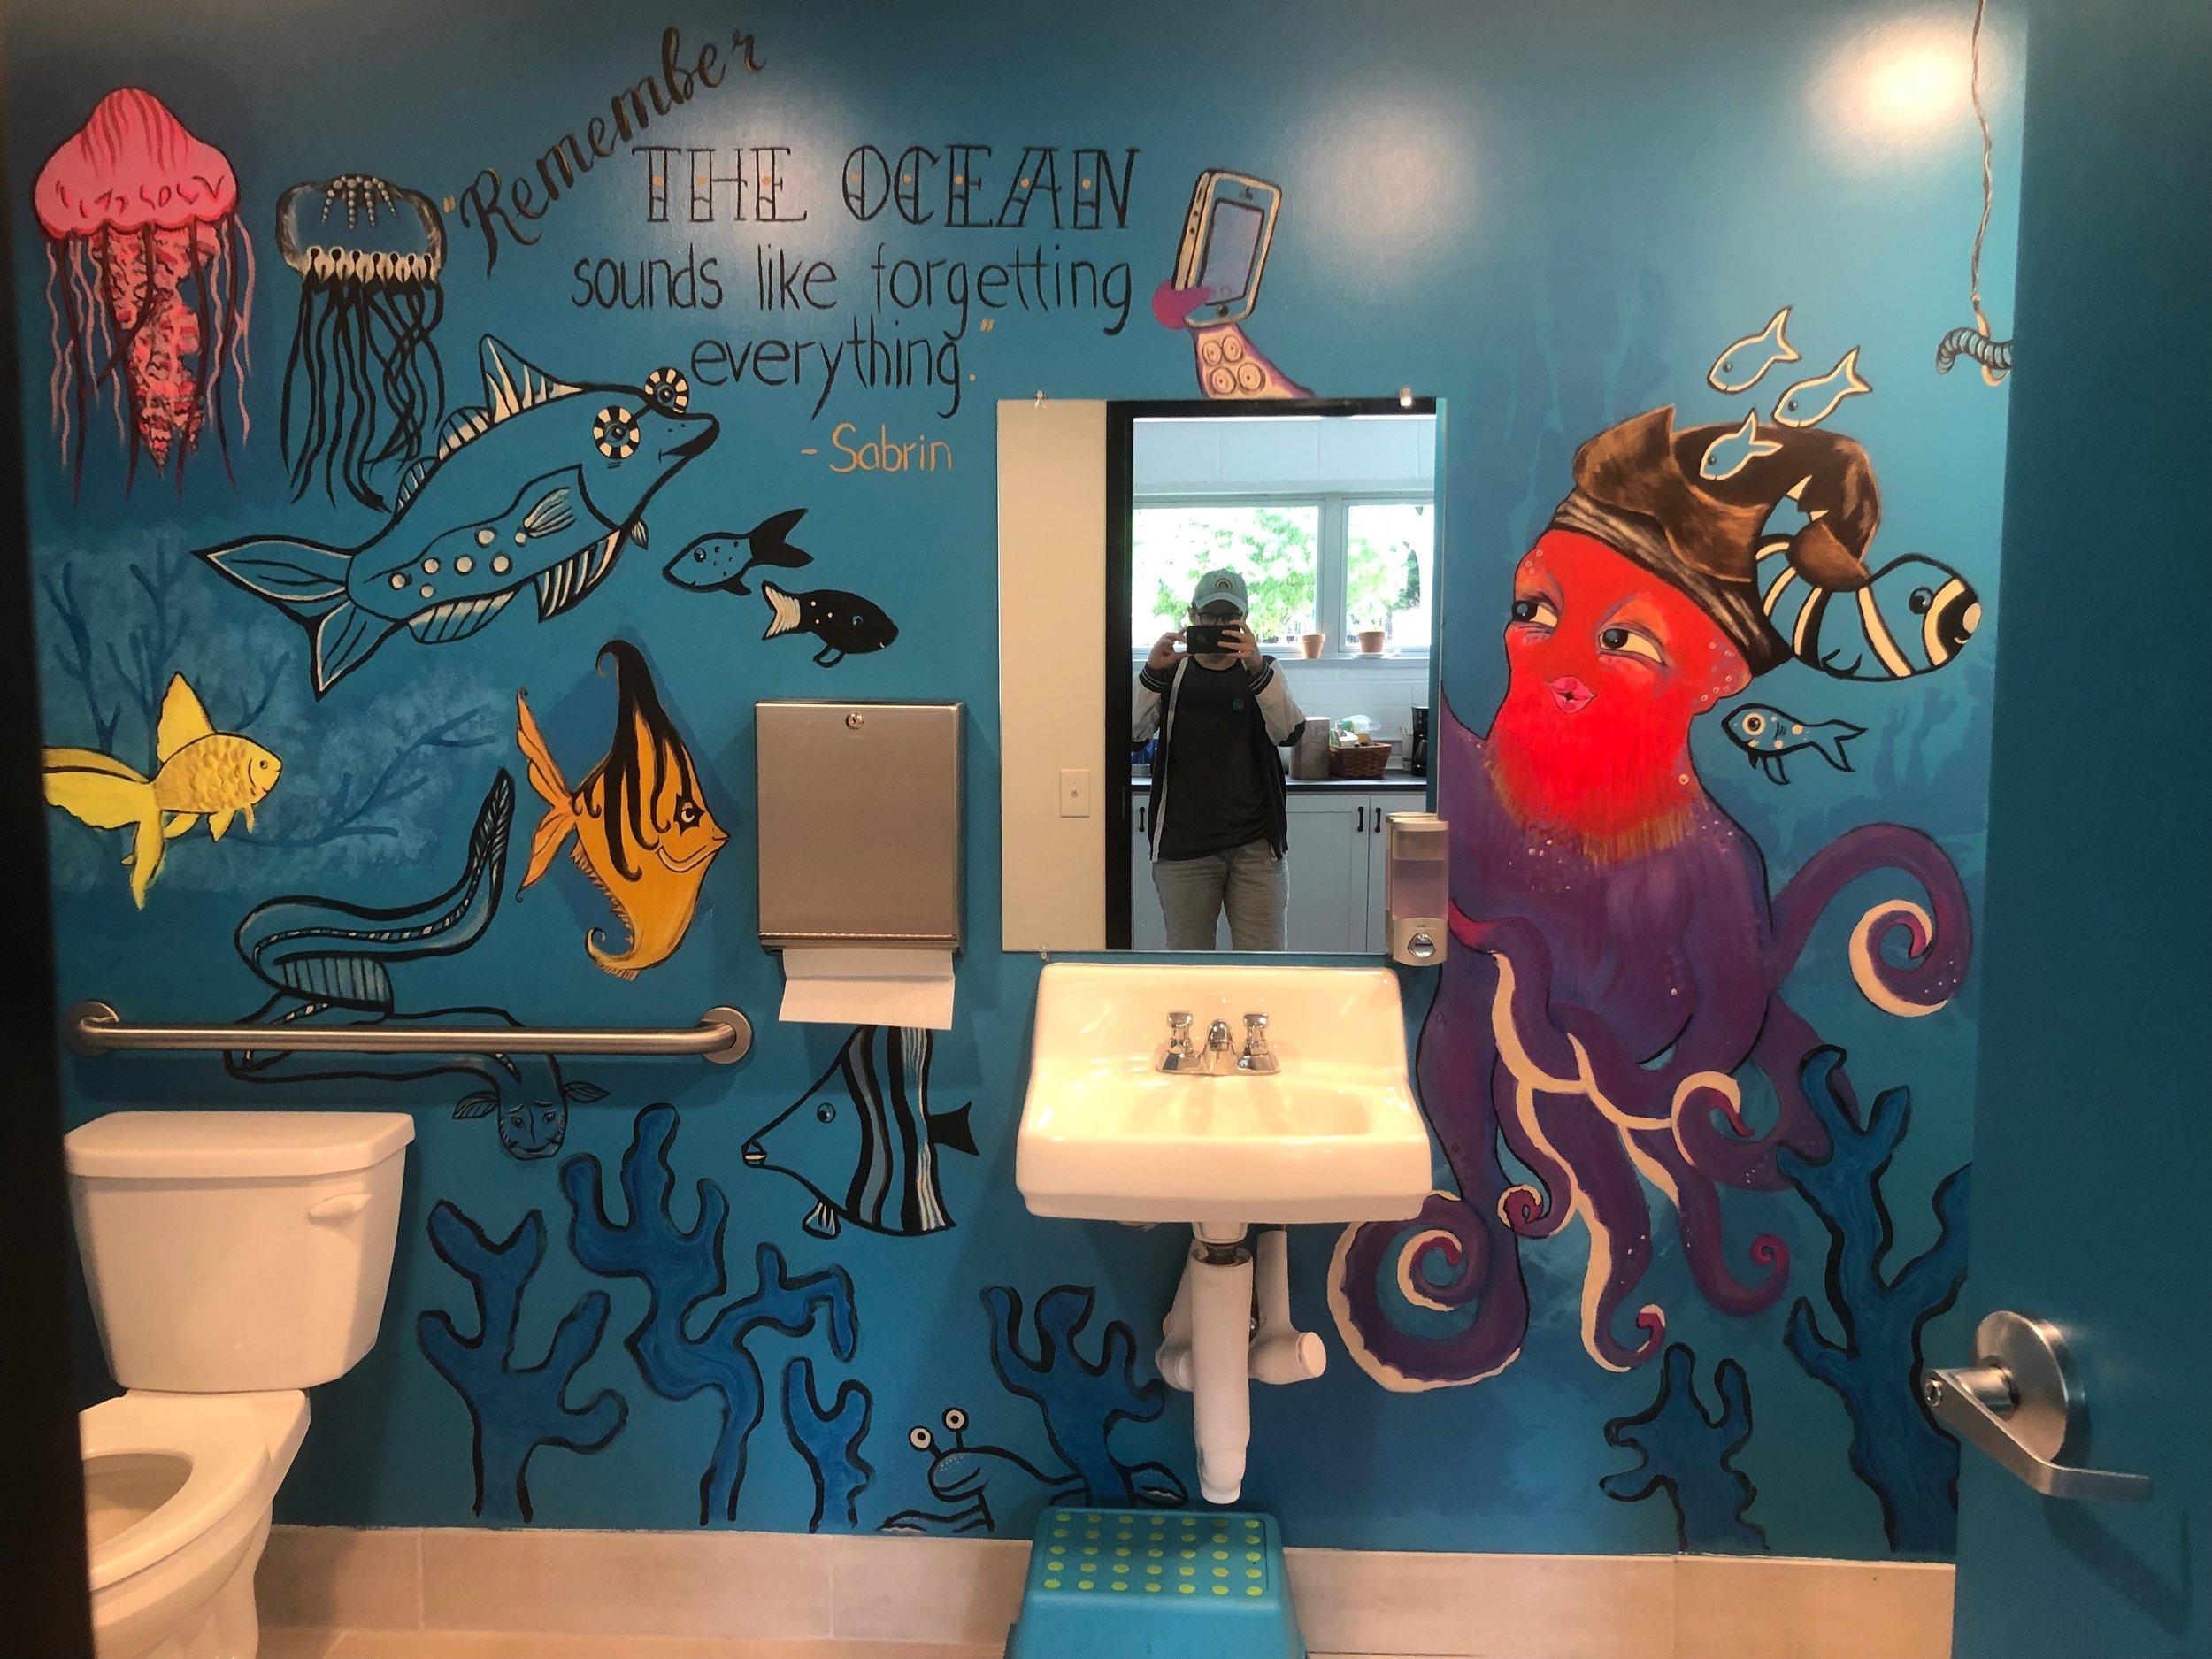 Thank you Lera Skvortsova for transforming MOI's bathroom!  Follow Lera on Instagram @valeria.del.mar